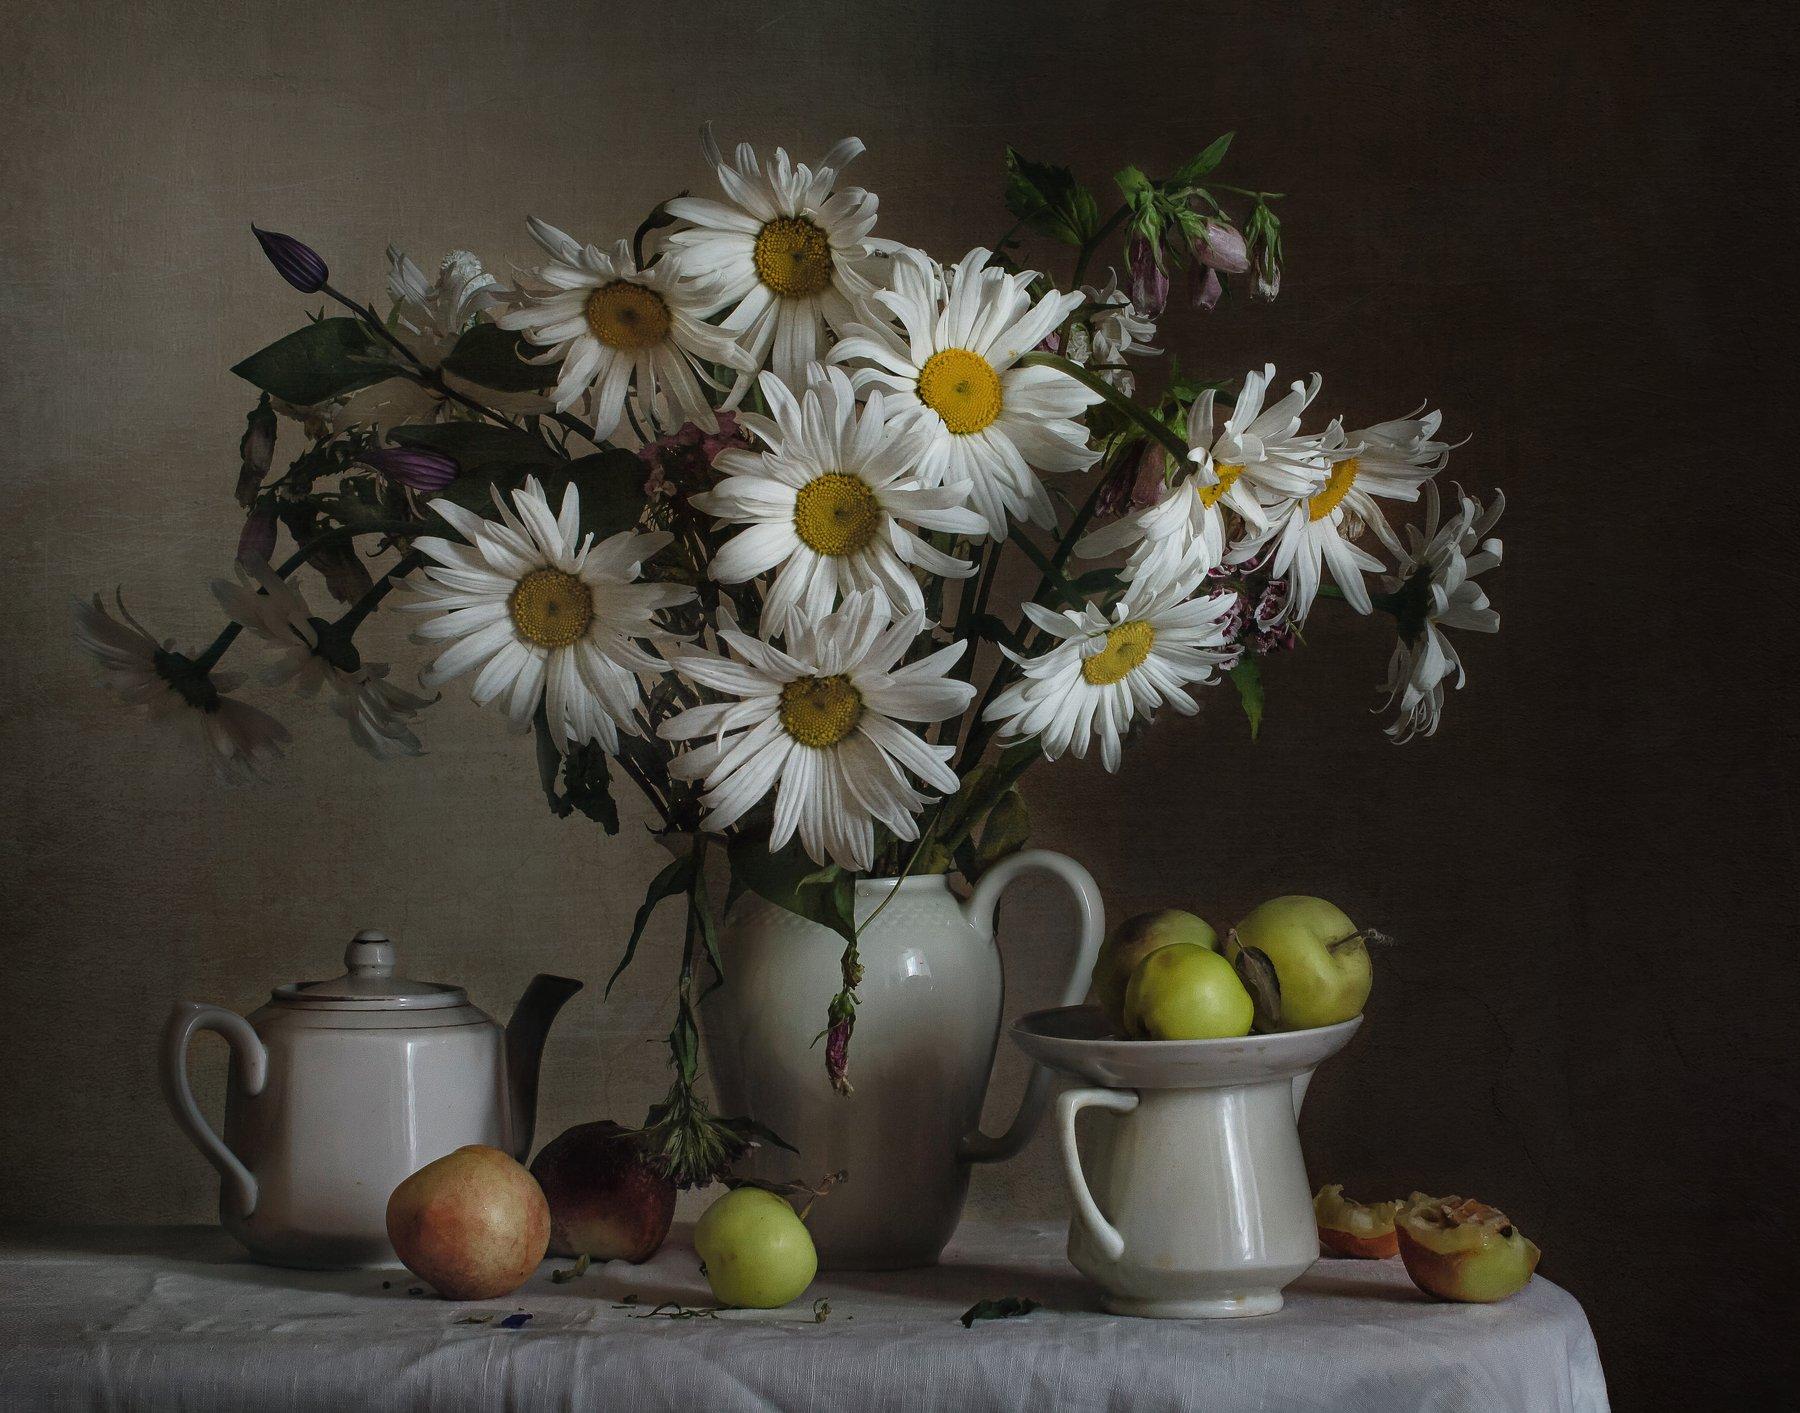 натюрморт, фарфор, кувшин, цветы, ромашки, фрукты, Анна Петина